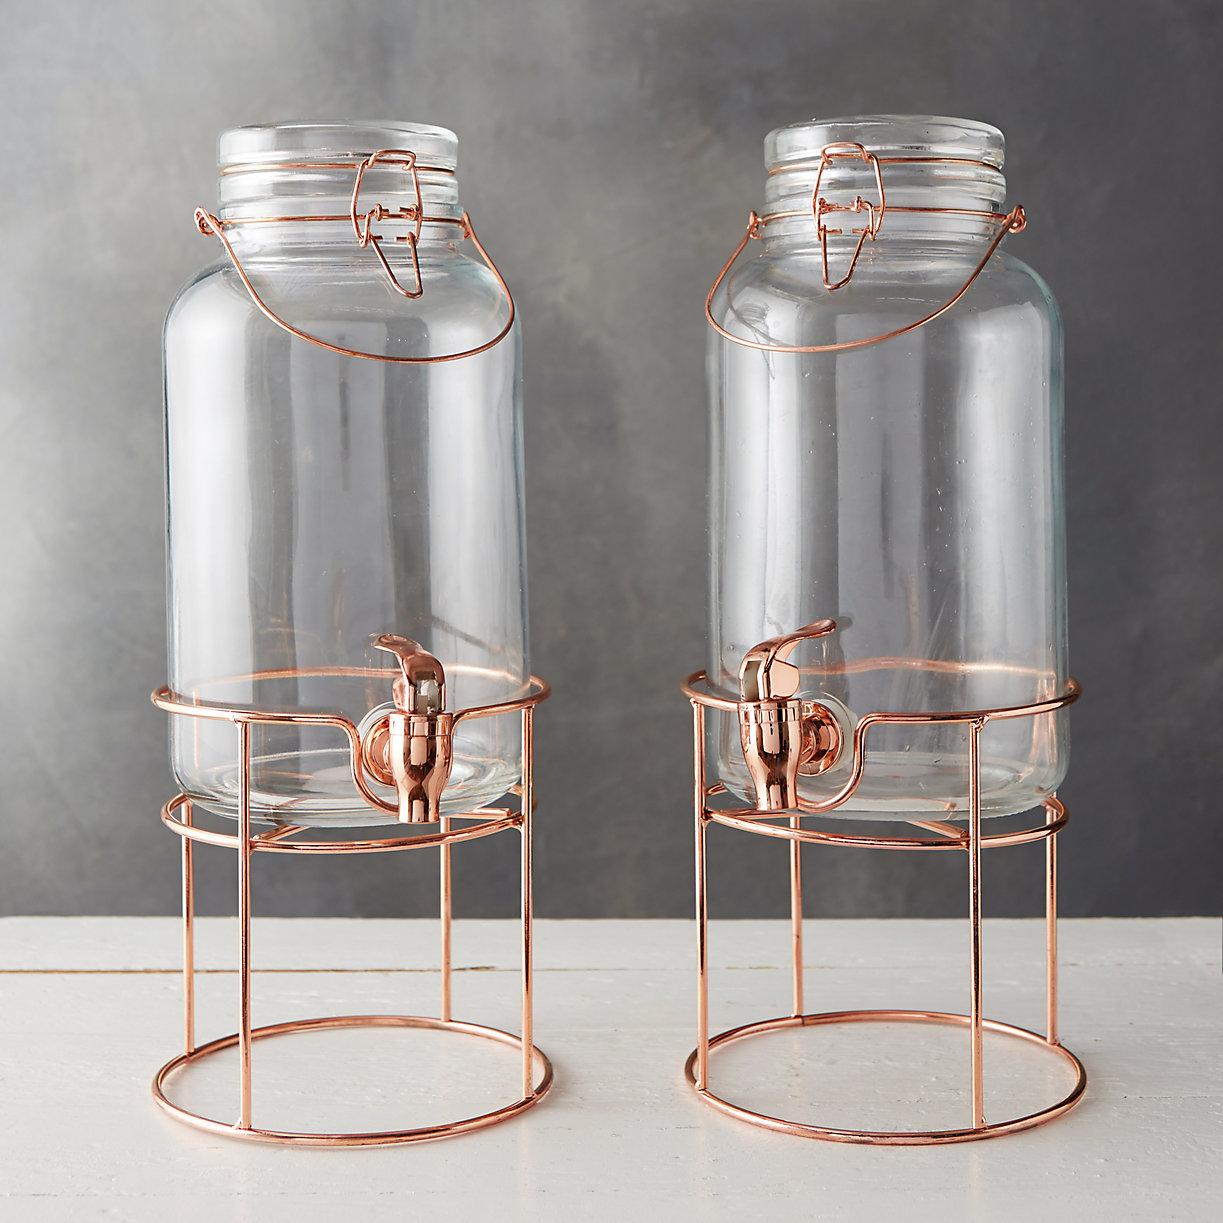 Copper Glass Drink Dispenser Set Terrain